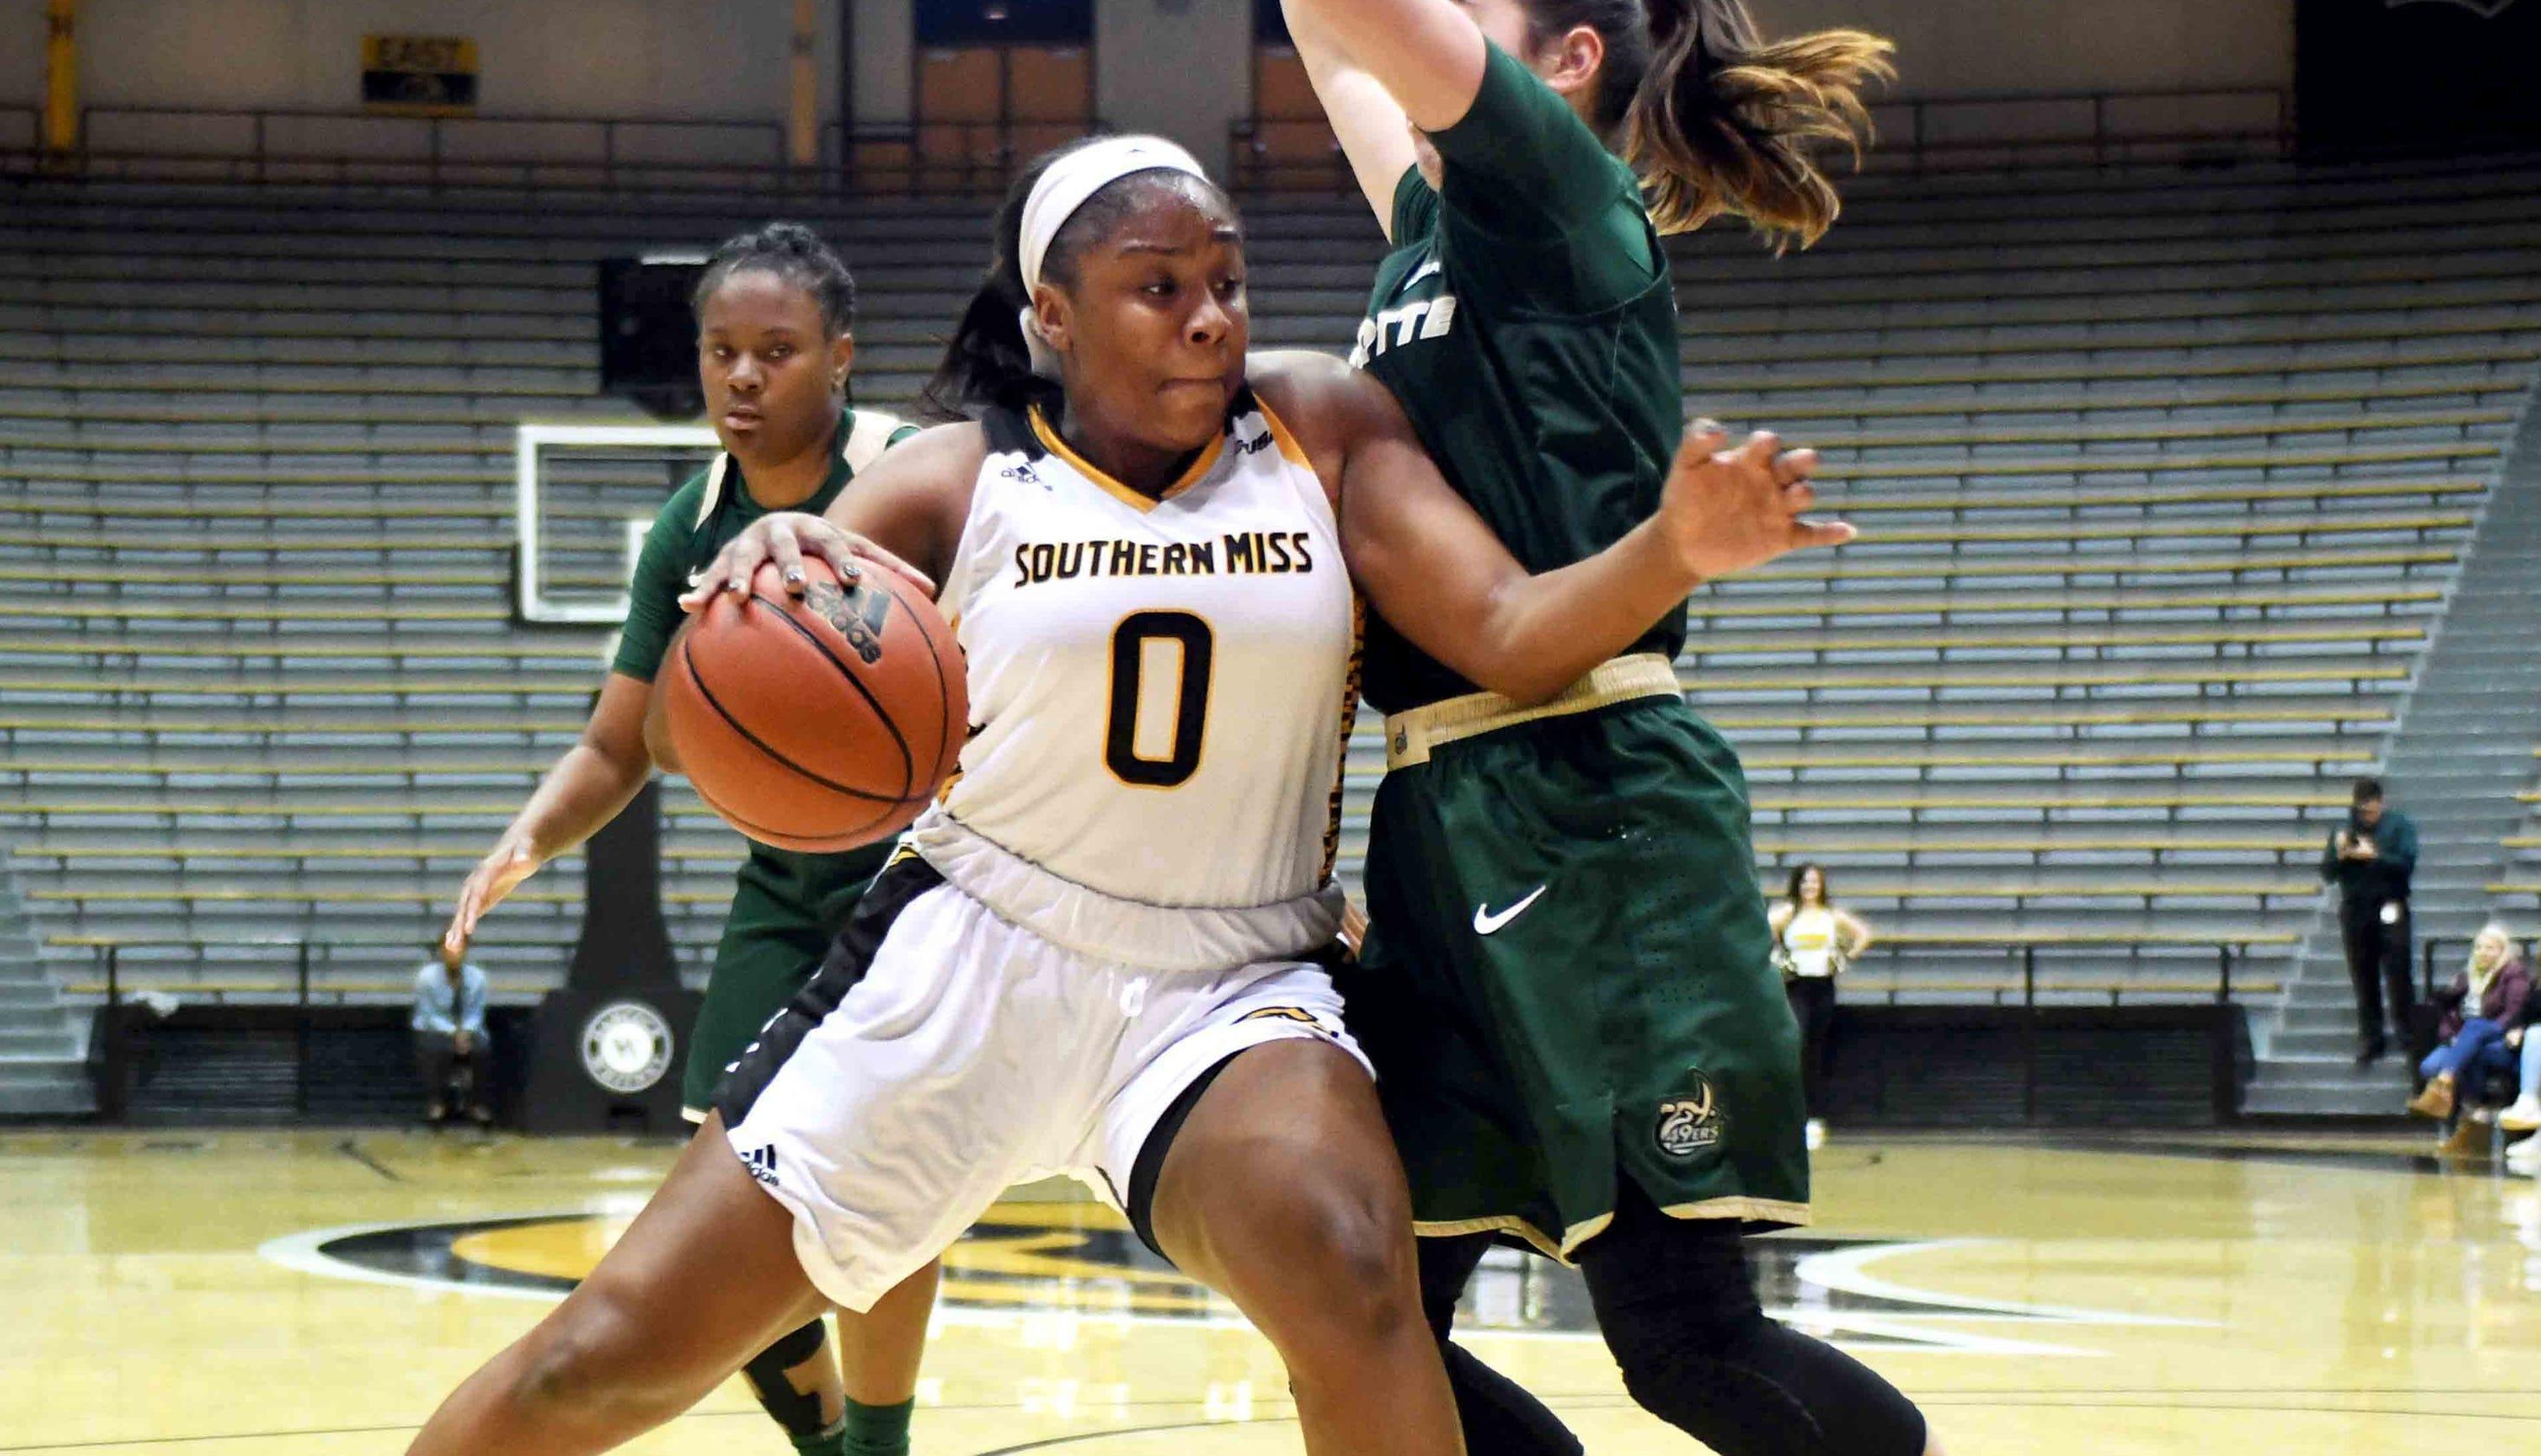 Southern Miss women's basketball vs. Charlotte